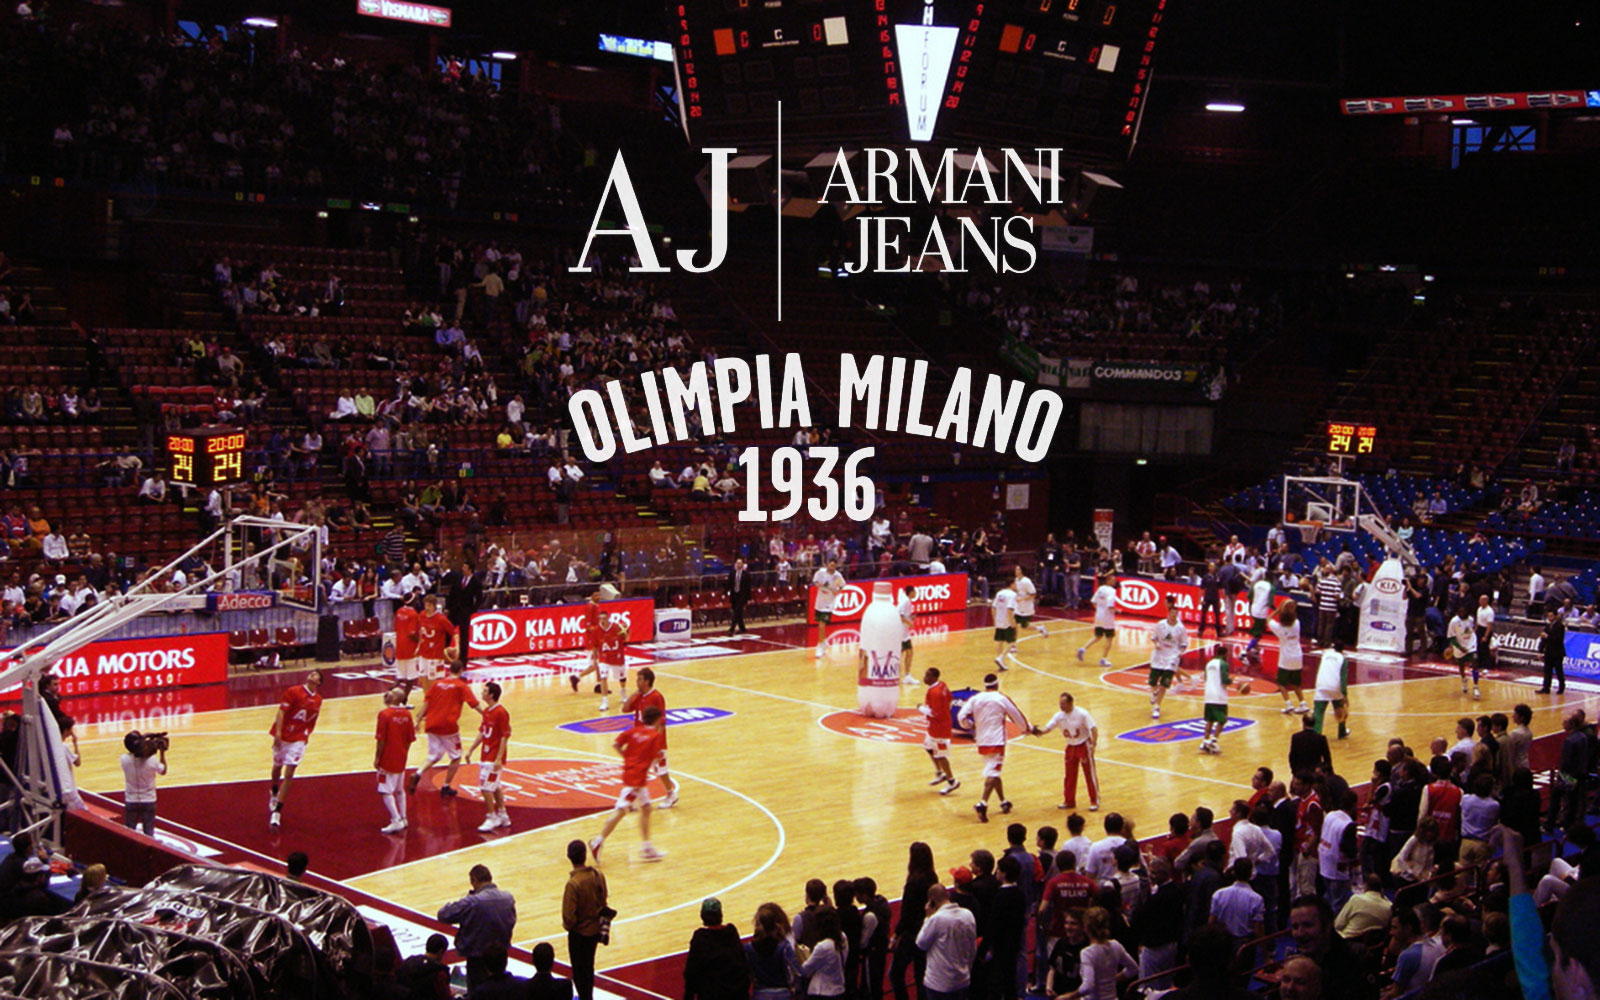 Armani Jeans | Olimpia Milano